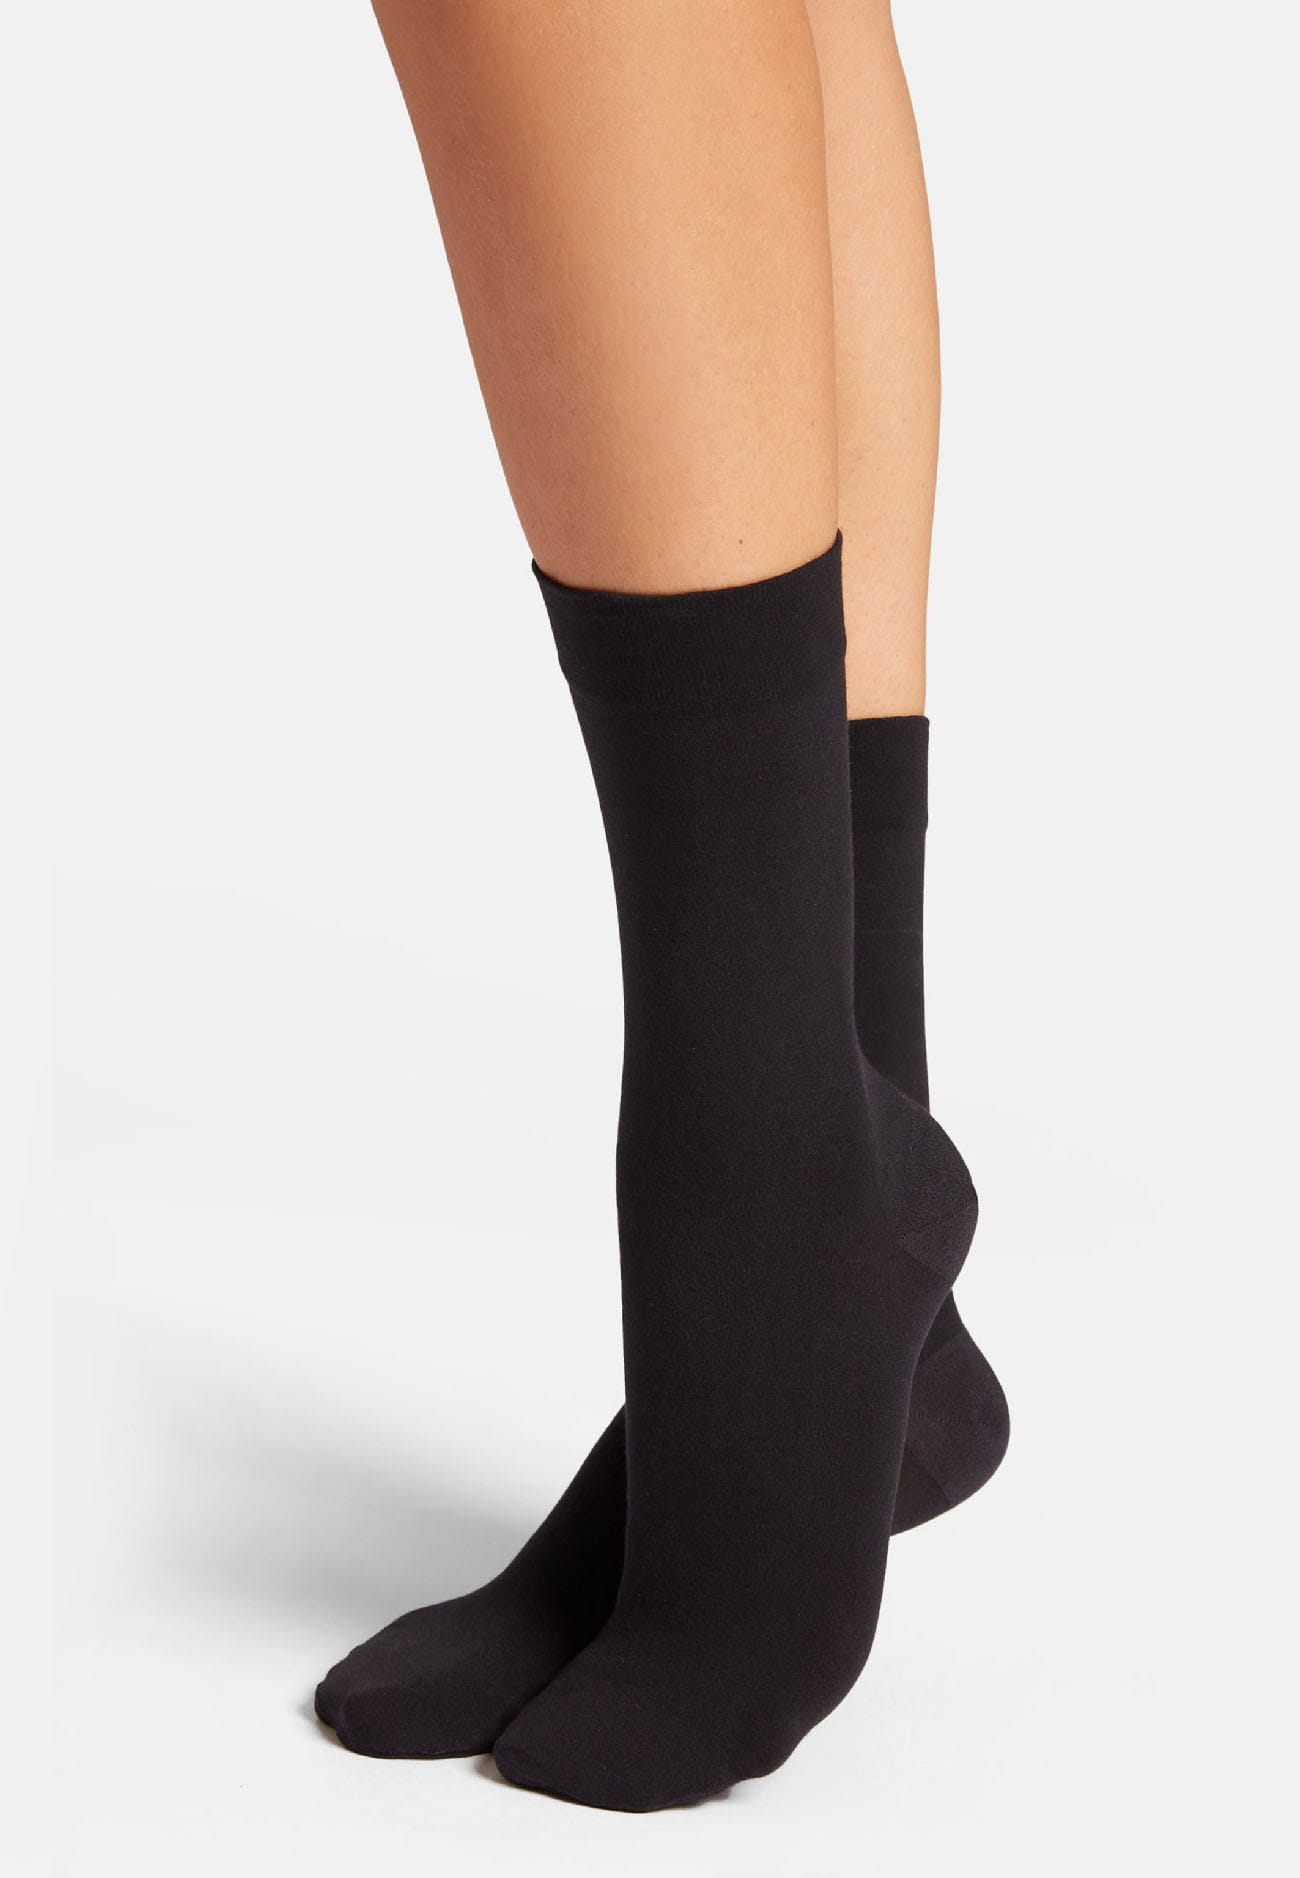 45019 Cotton Socks